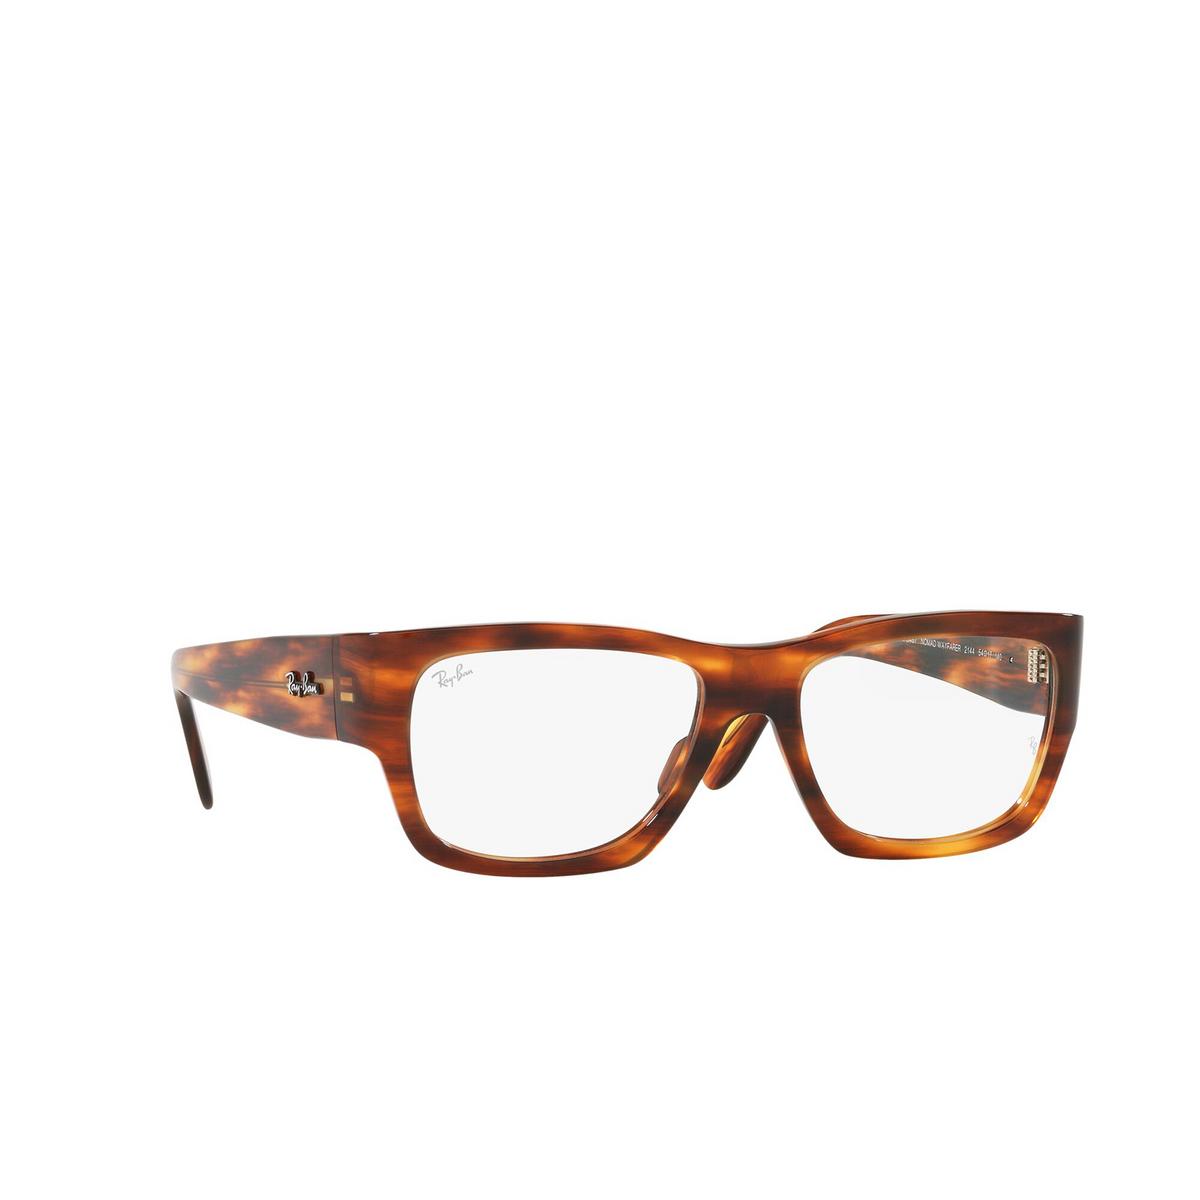 Ray-Ban® Square Eyeglasses: Nomad Wayfarer RX5487 color Striped Havana 2144 - three-quarters view.